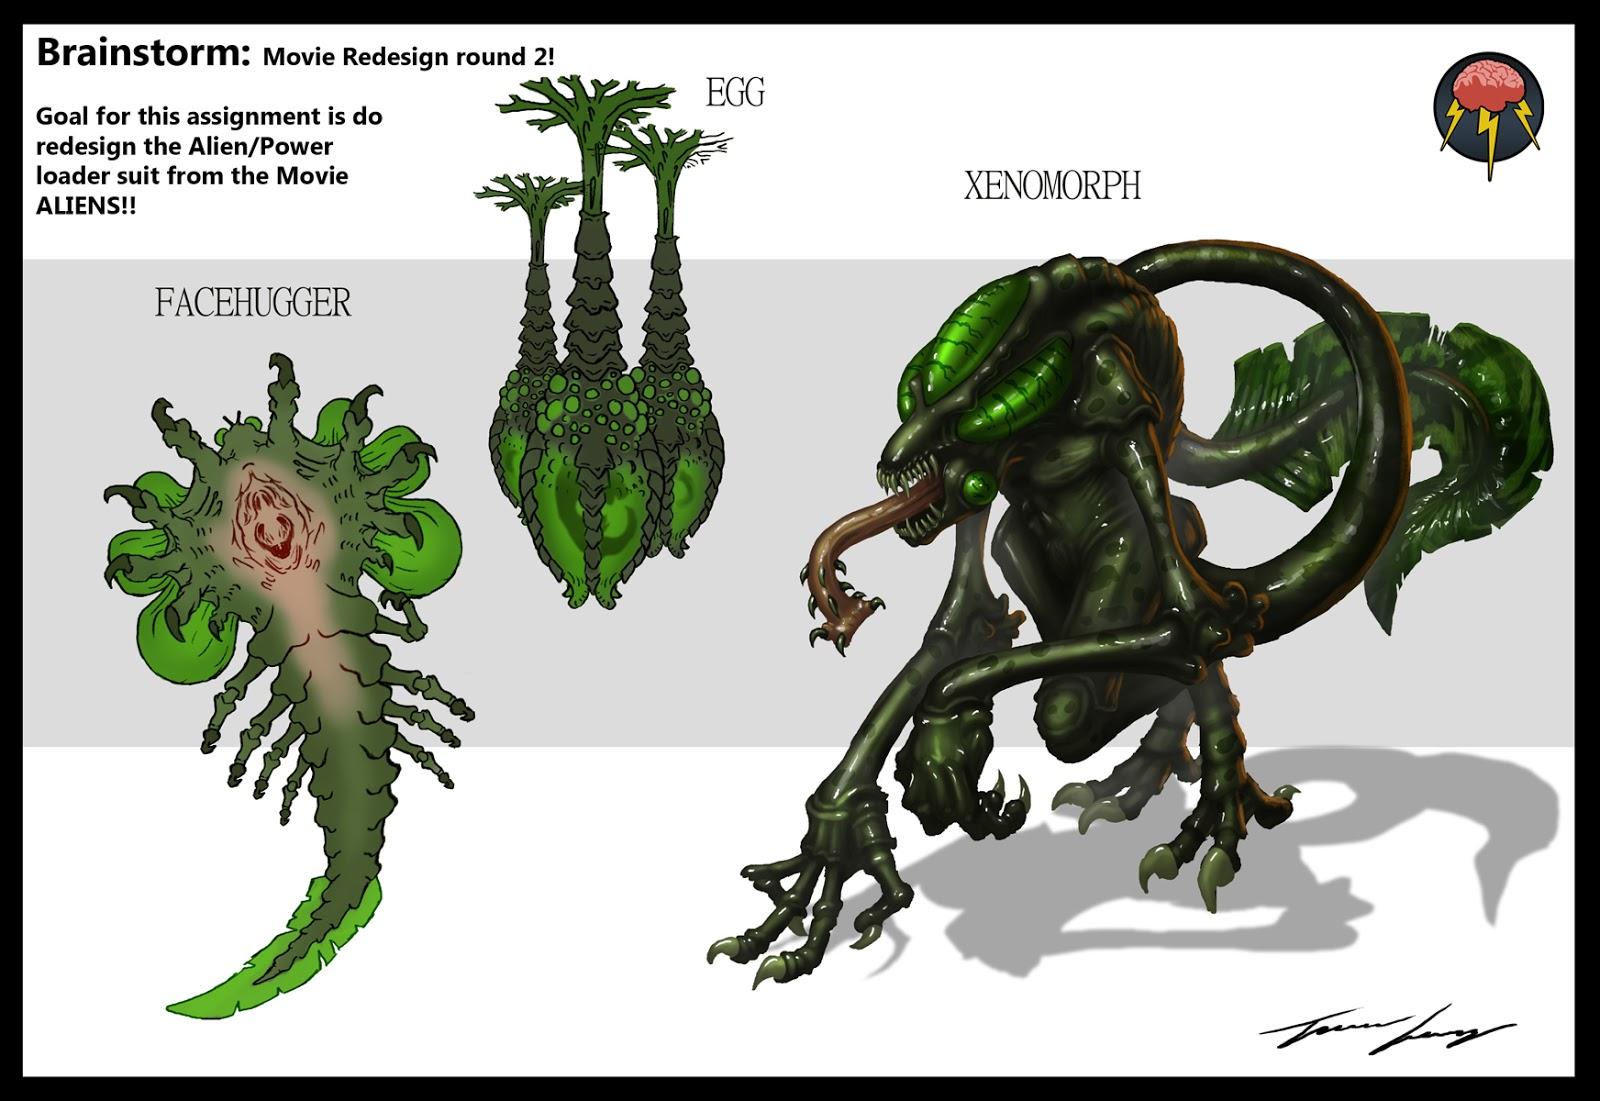 Brainstorm Alien Redesign